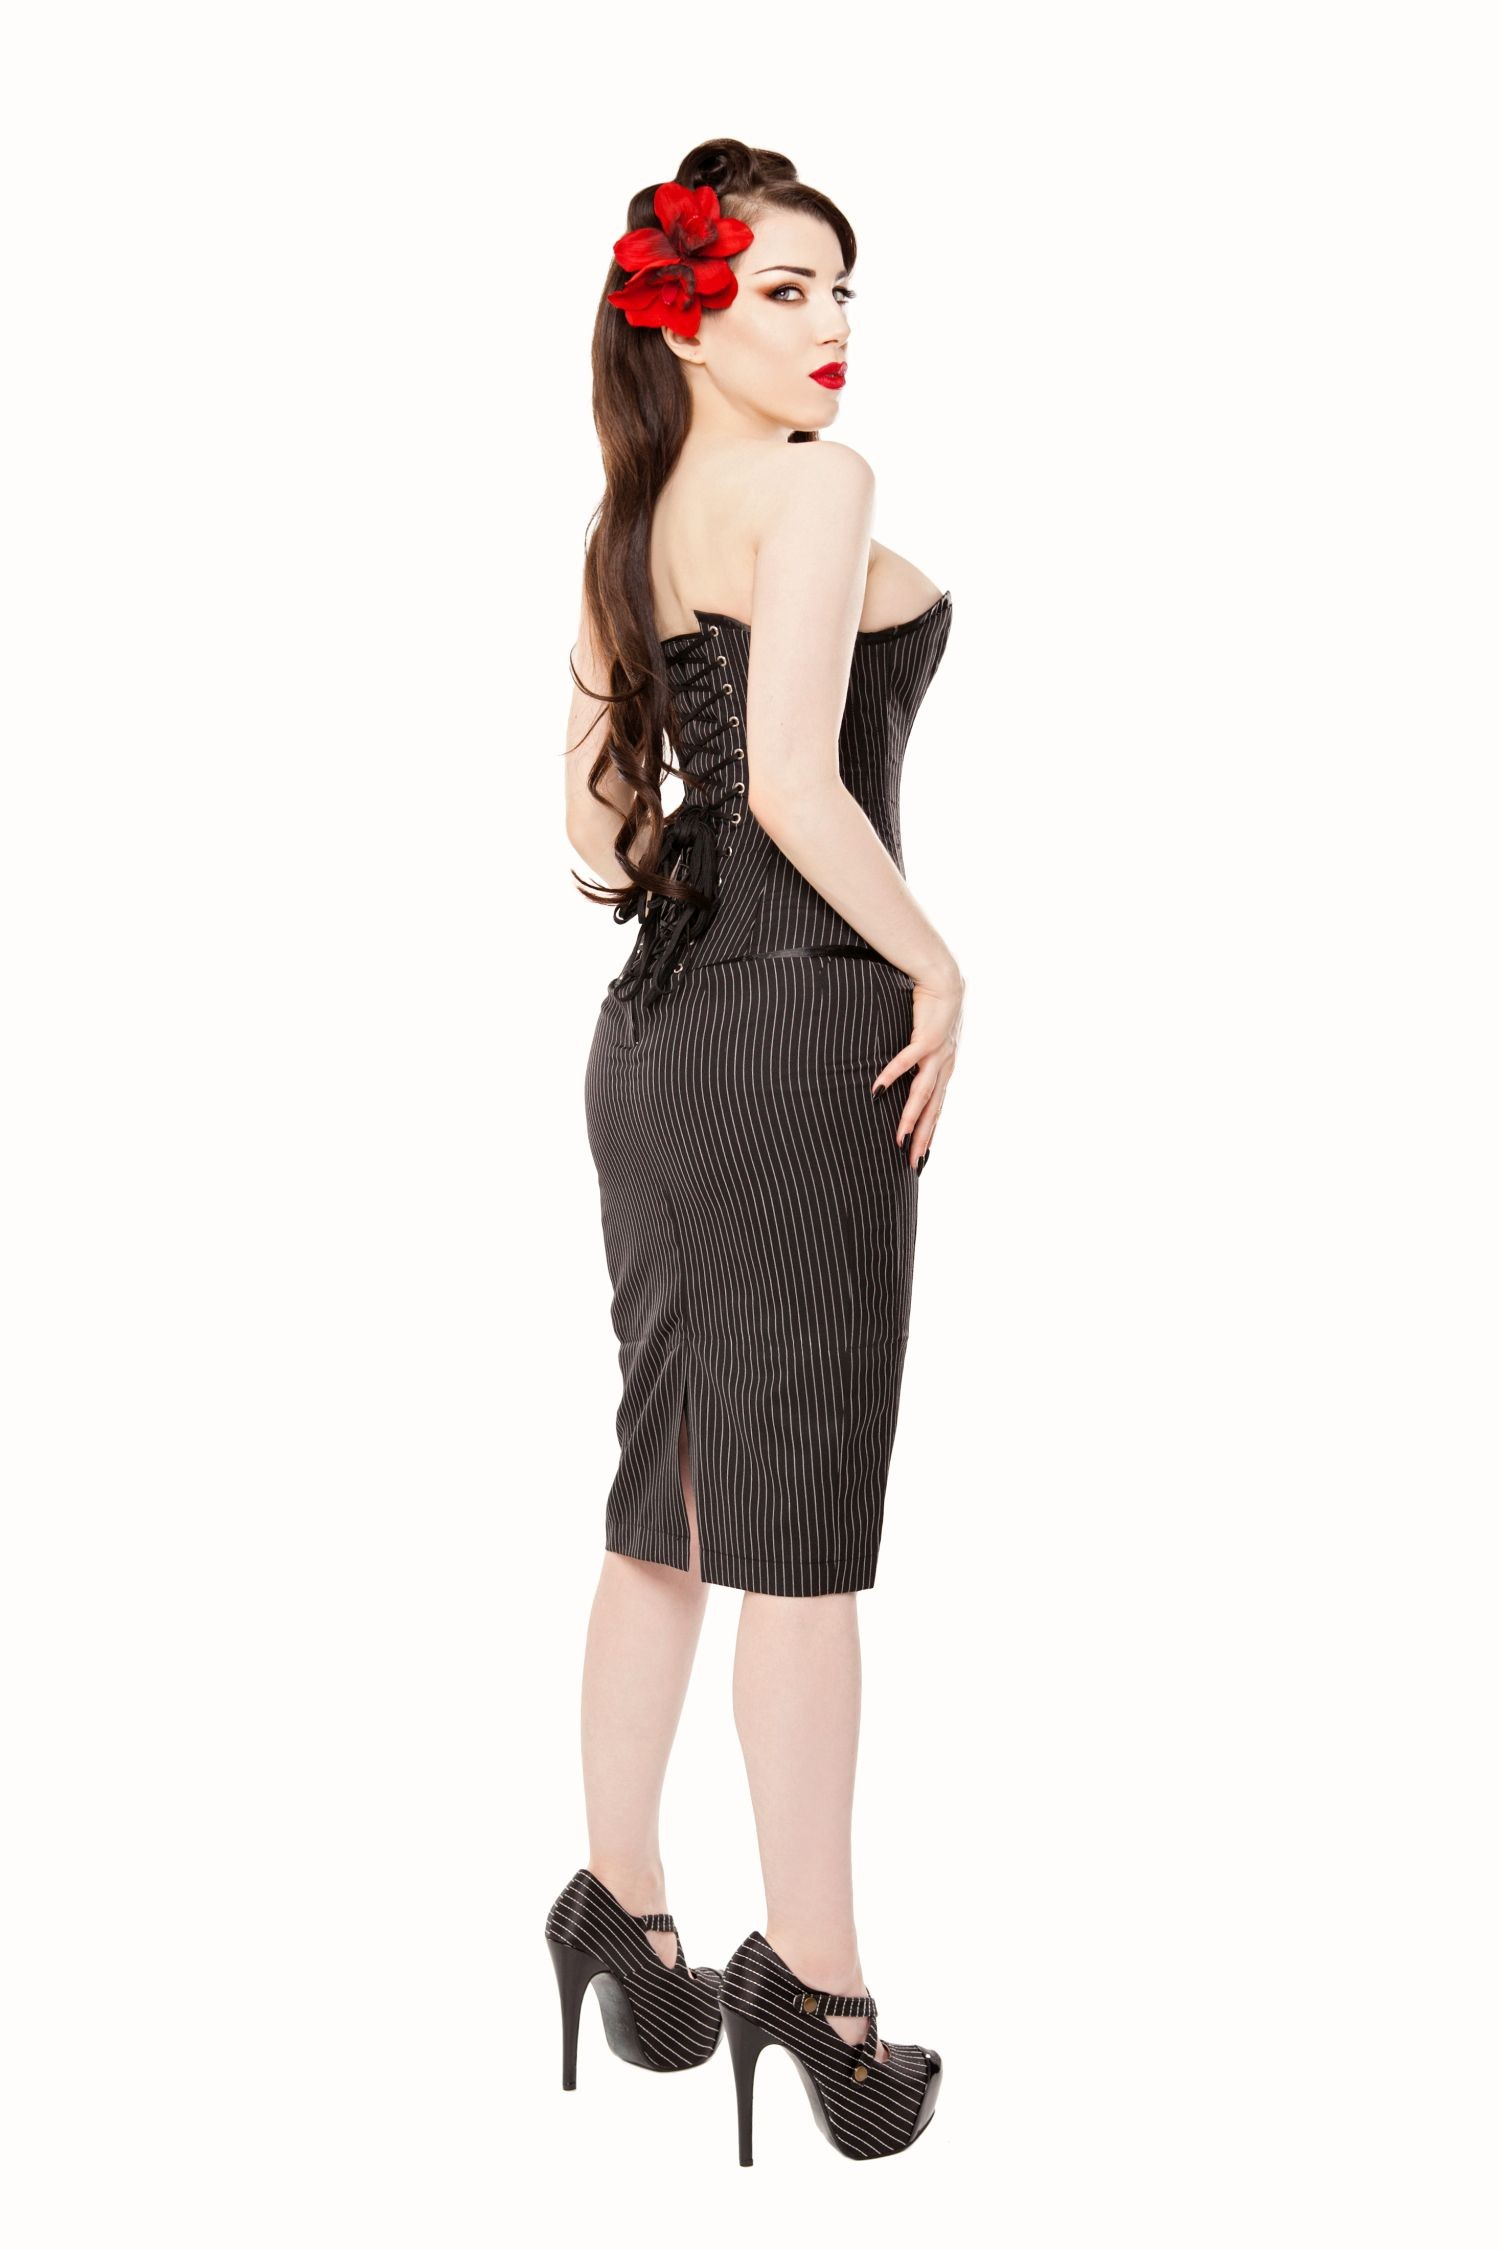 Playgirl Long Black Pinstripe Pencil Skirt